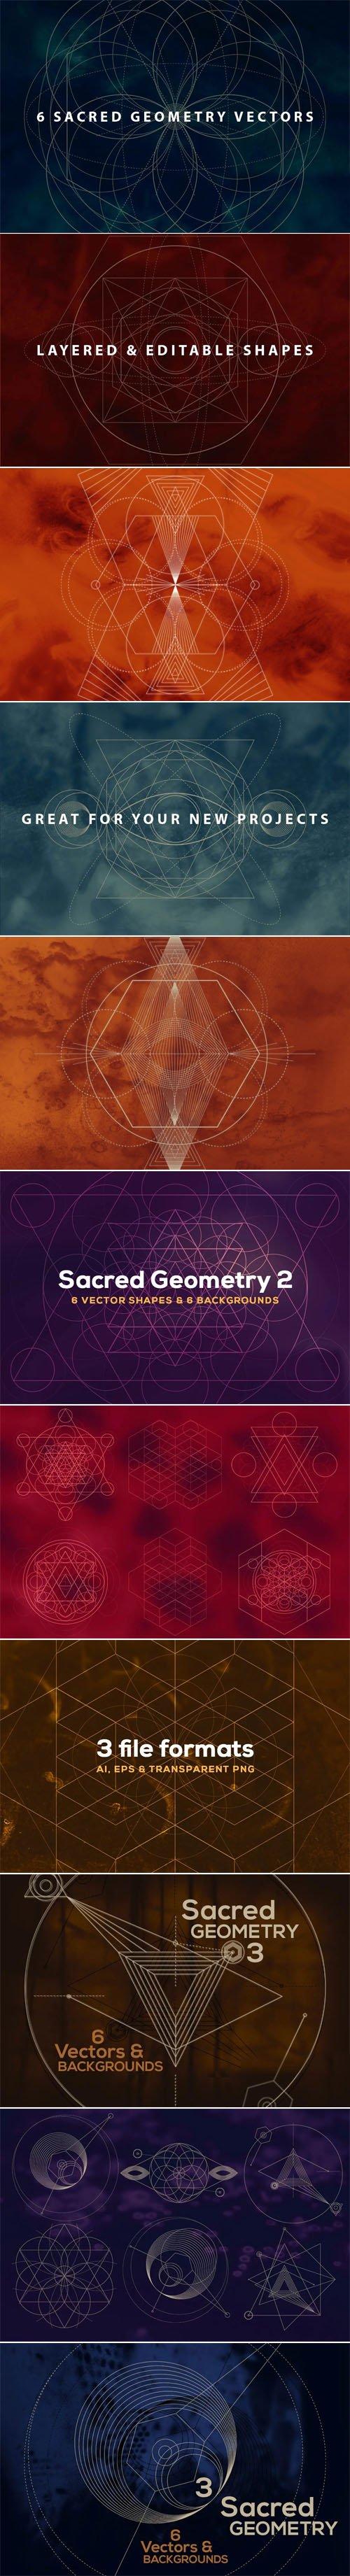 18 Sacred Geometry Vectors + Backgrounds